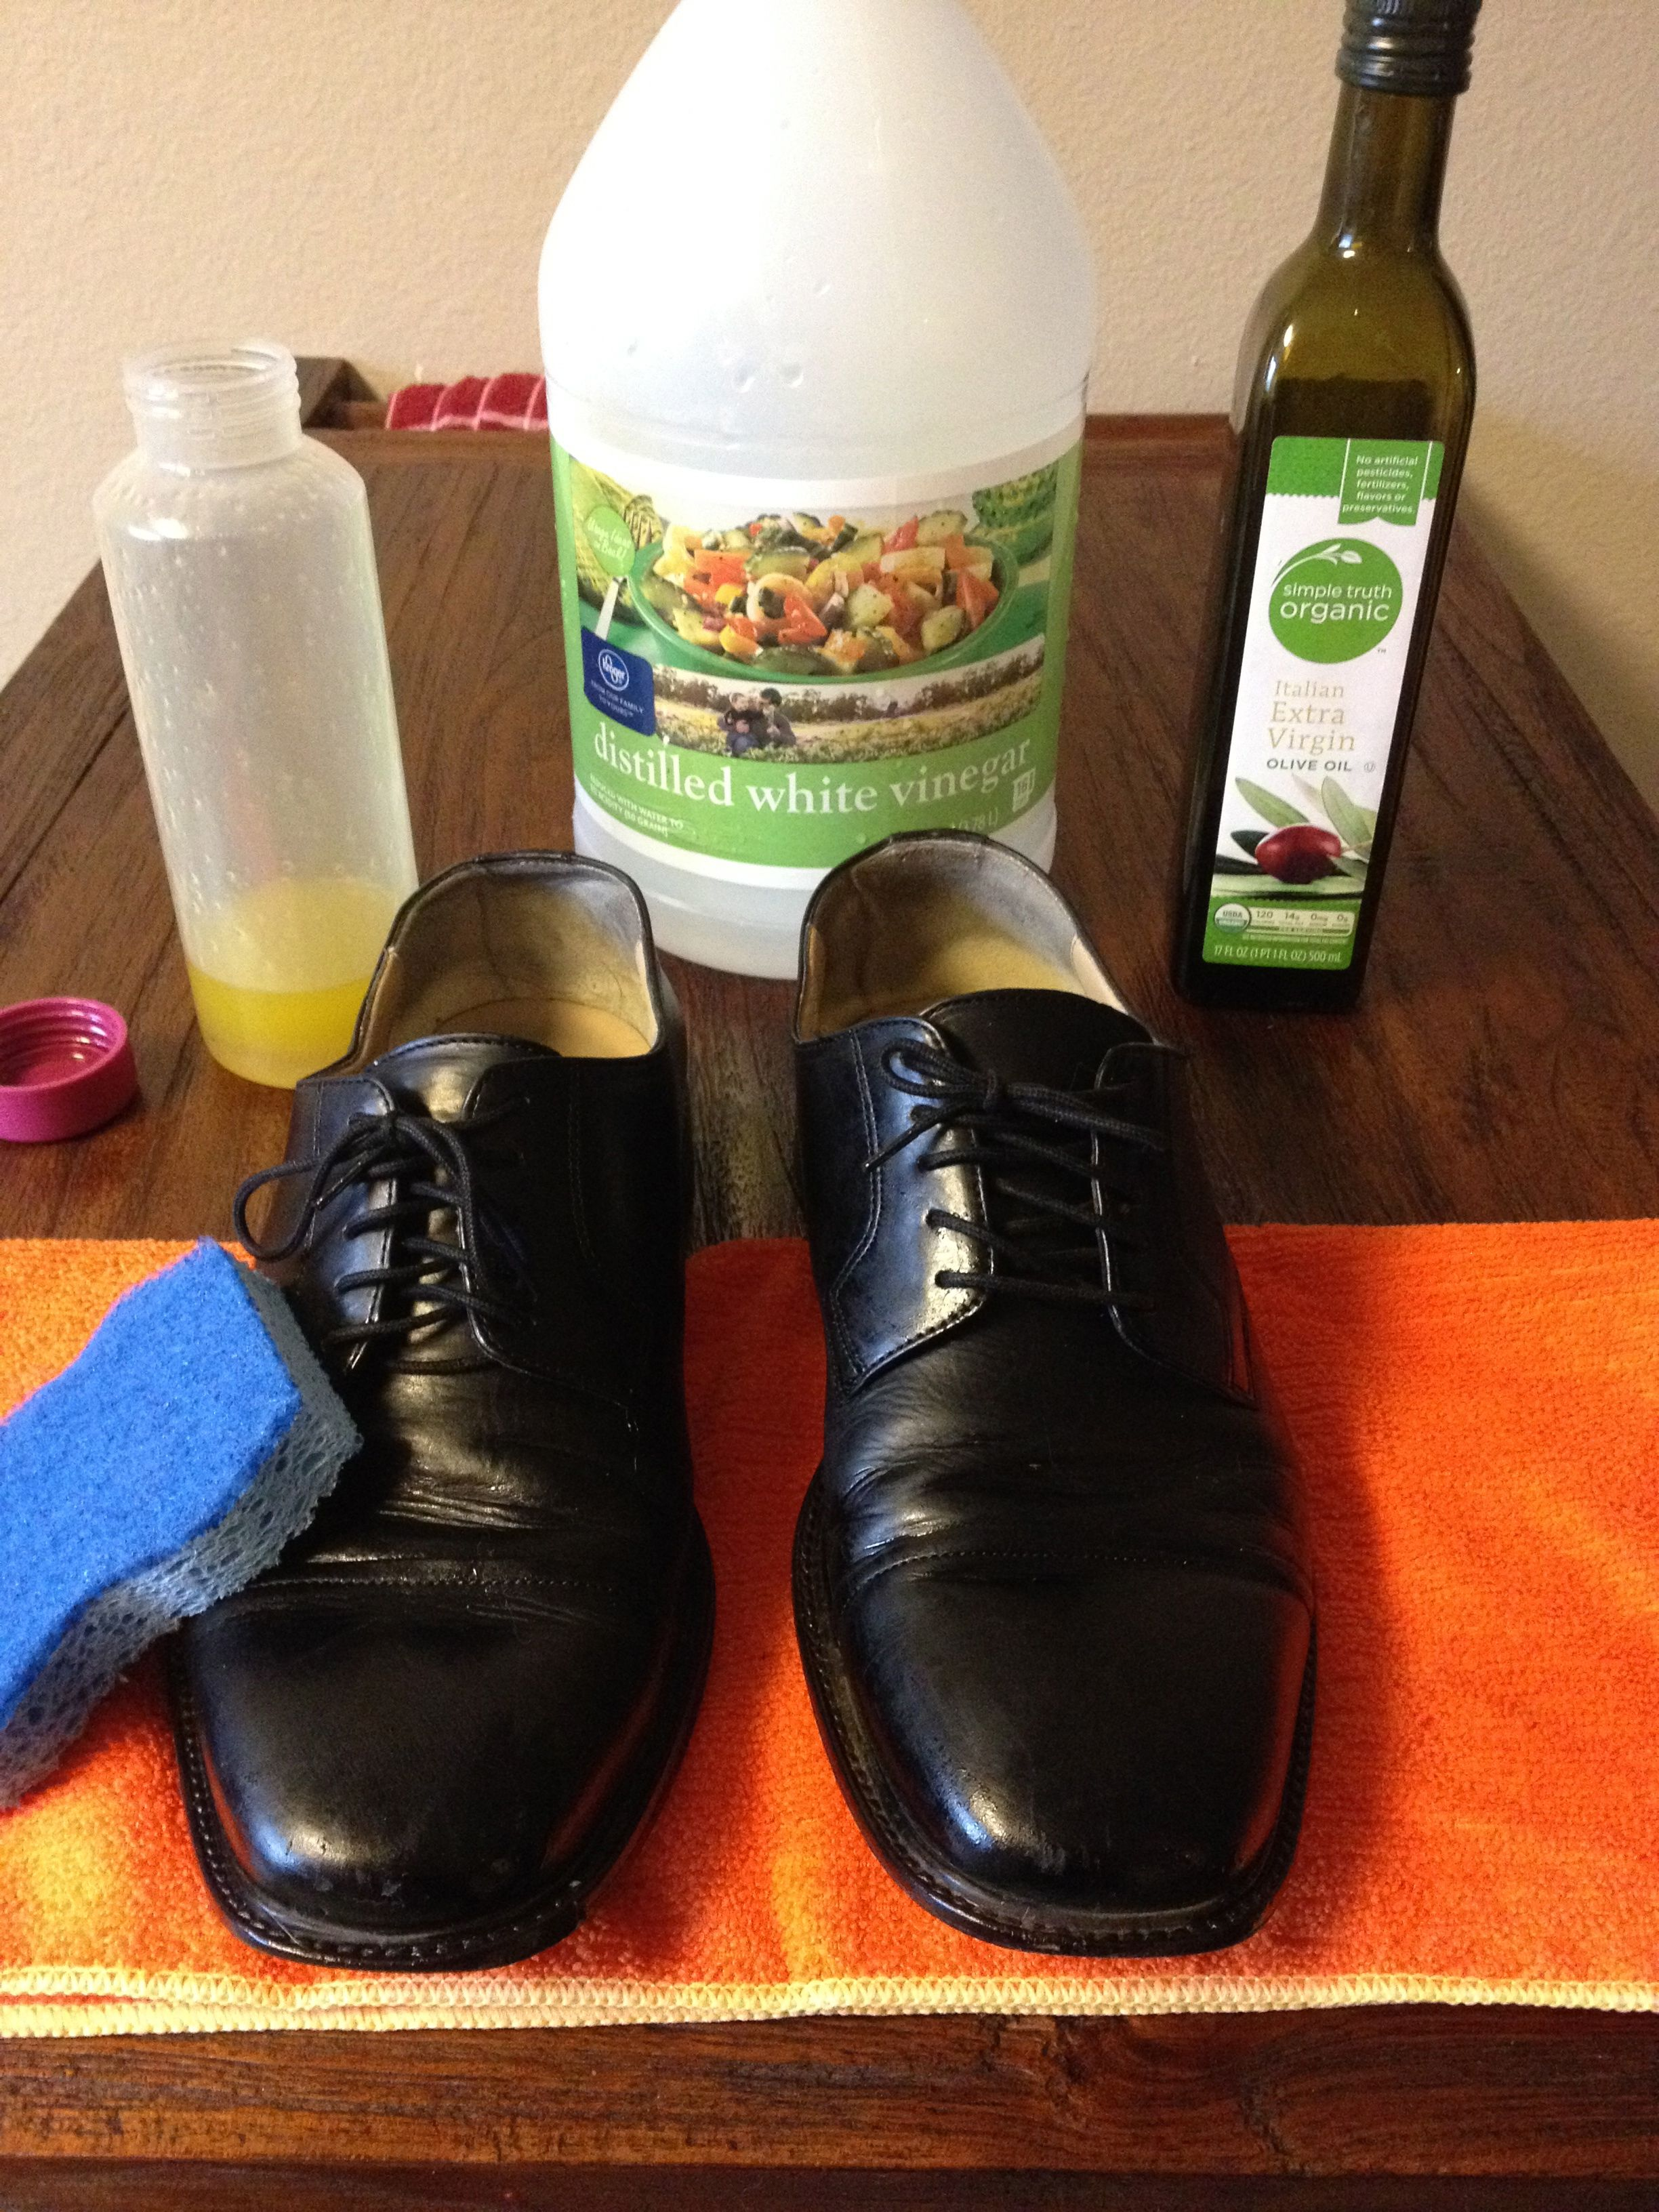 New Quick Shine Shoes Shine Sponge Brush Polish Dust Cleaner Cleaning Tool P*CA